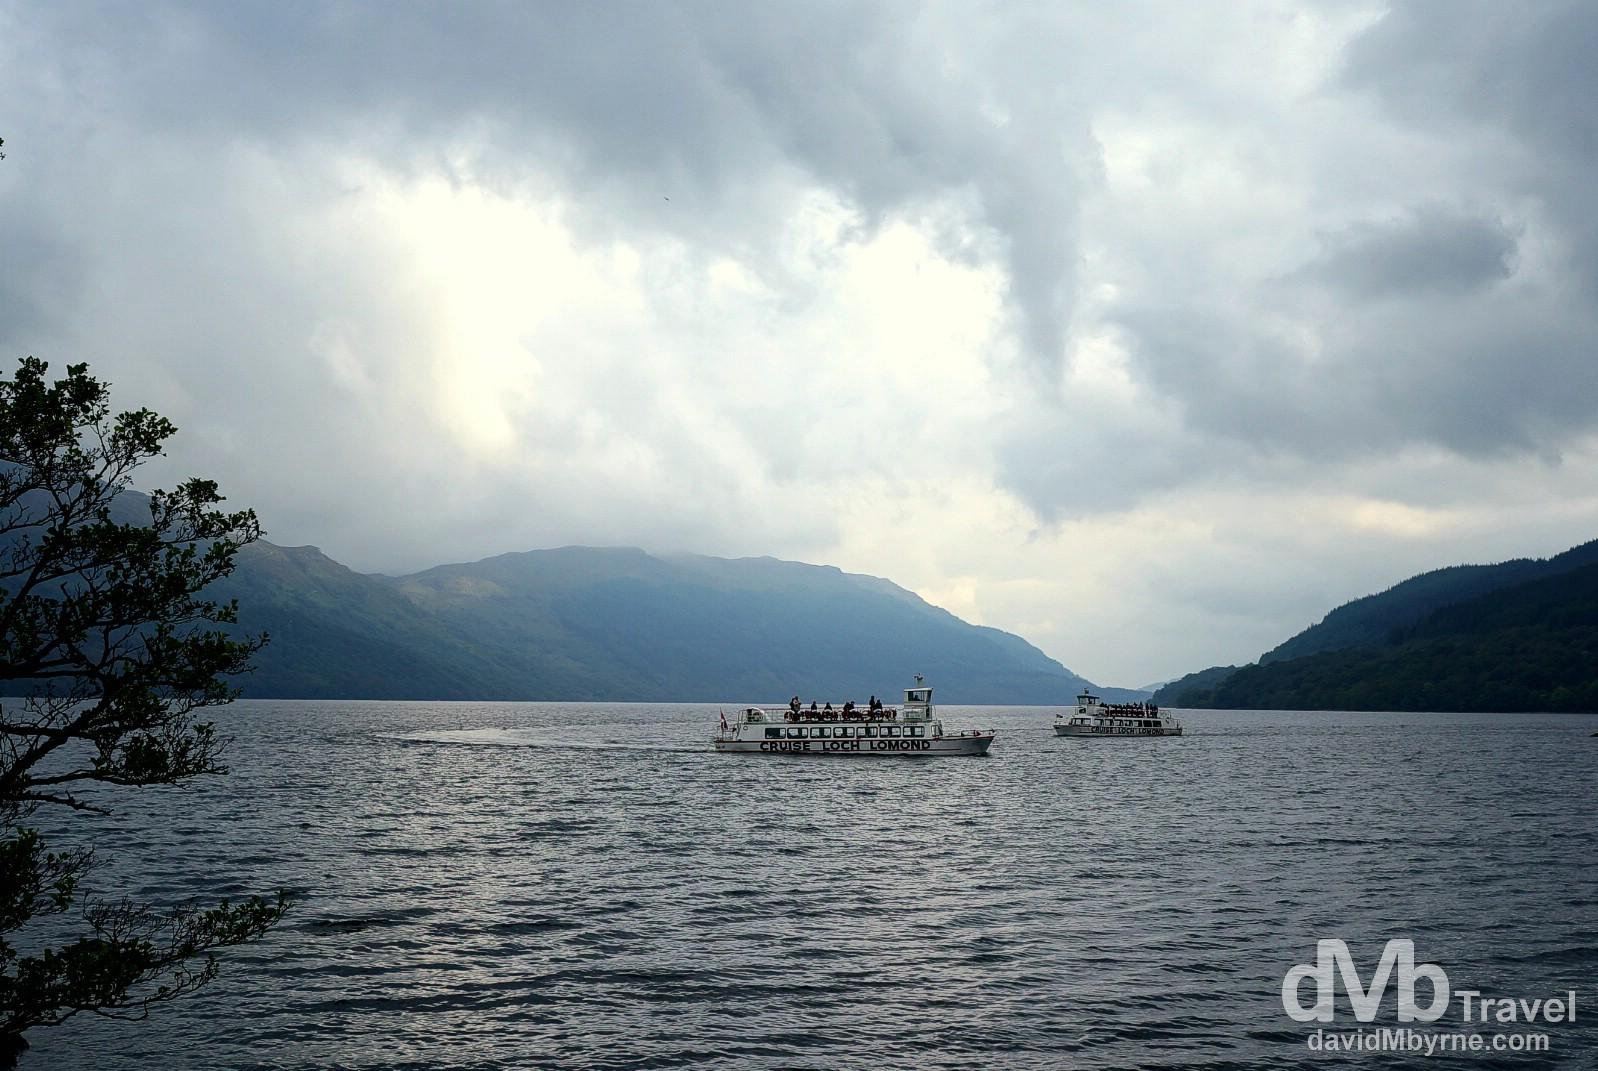 Tour boats on Lock Lomond, Scotland. September 18, 2014.